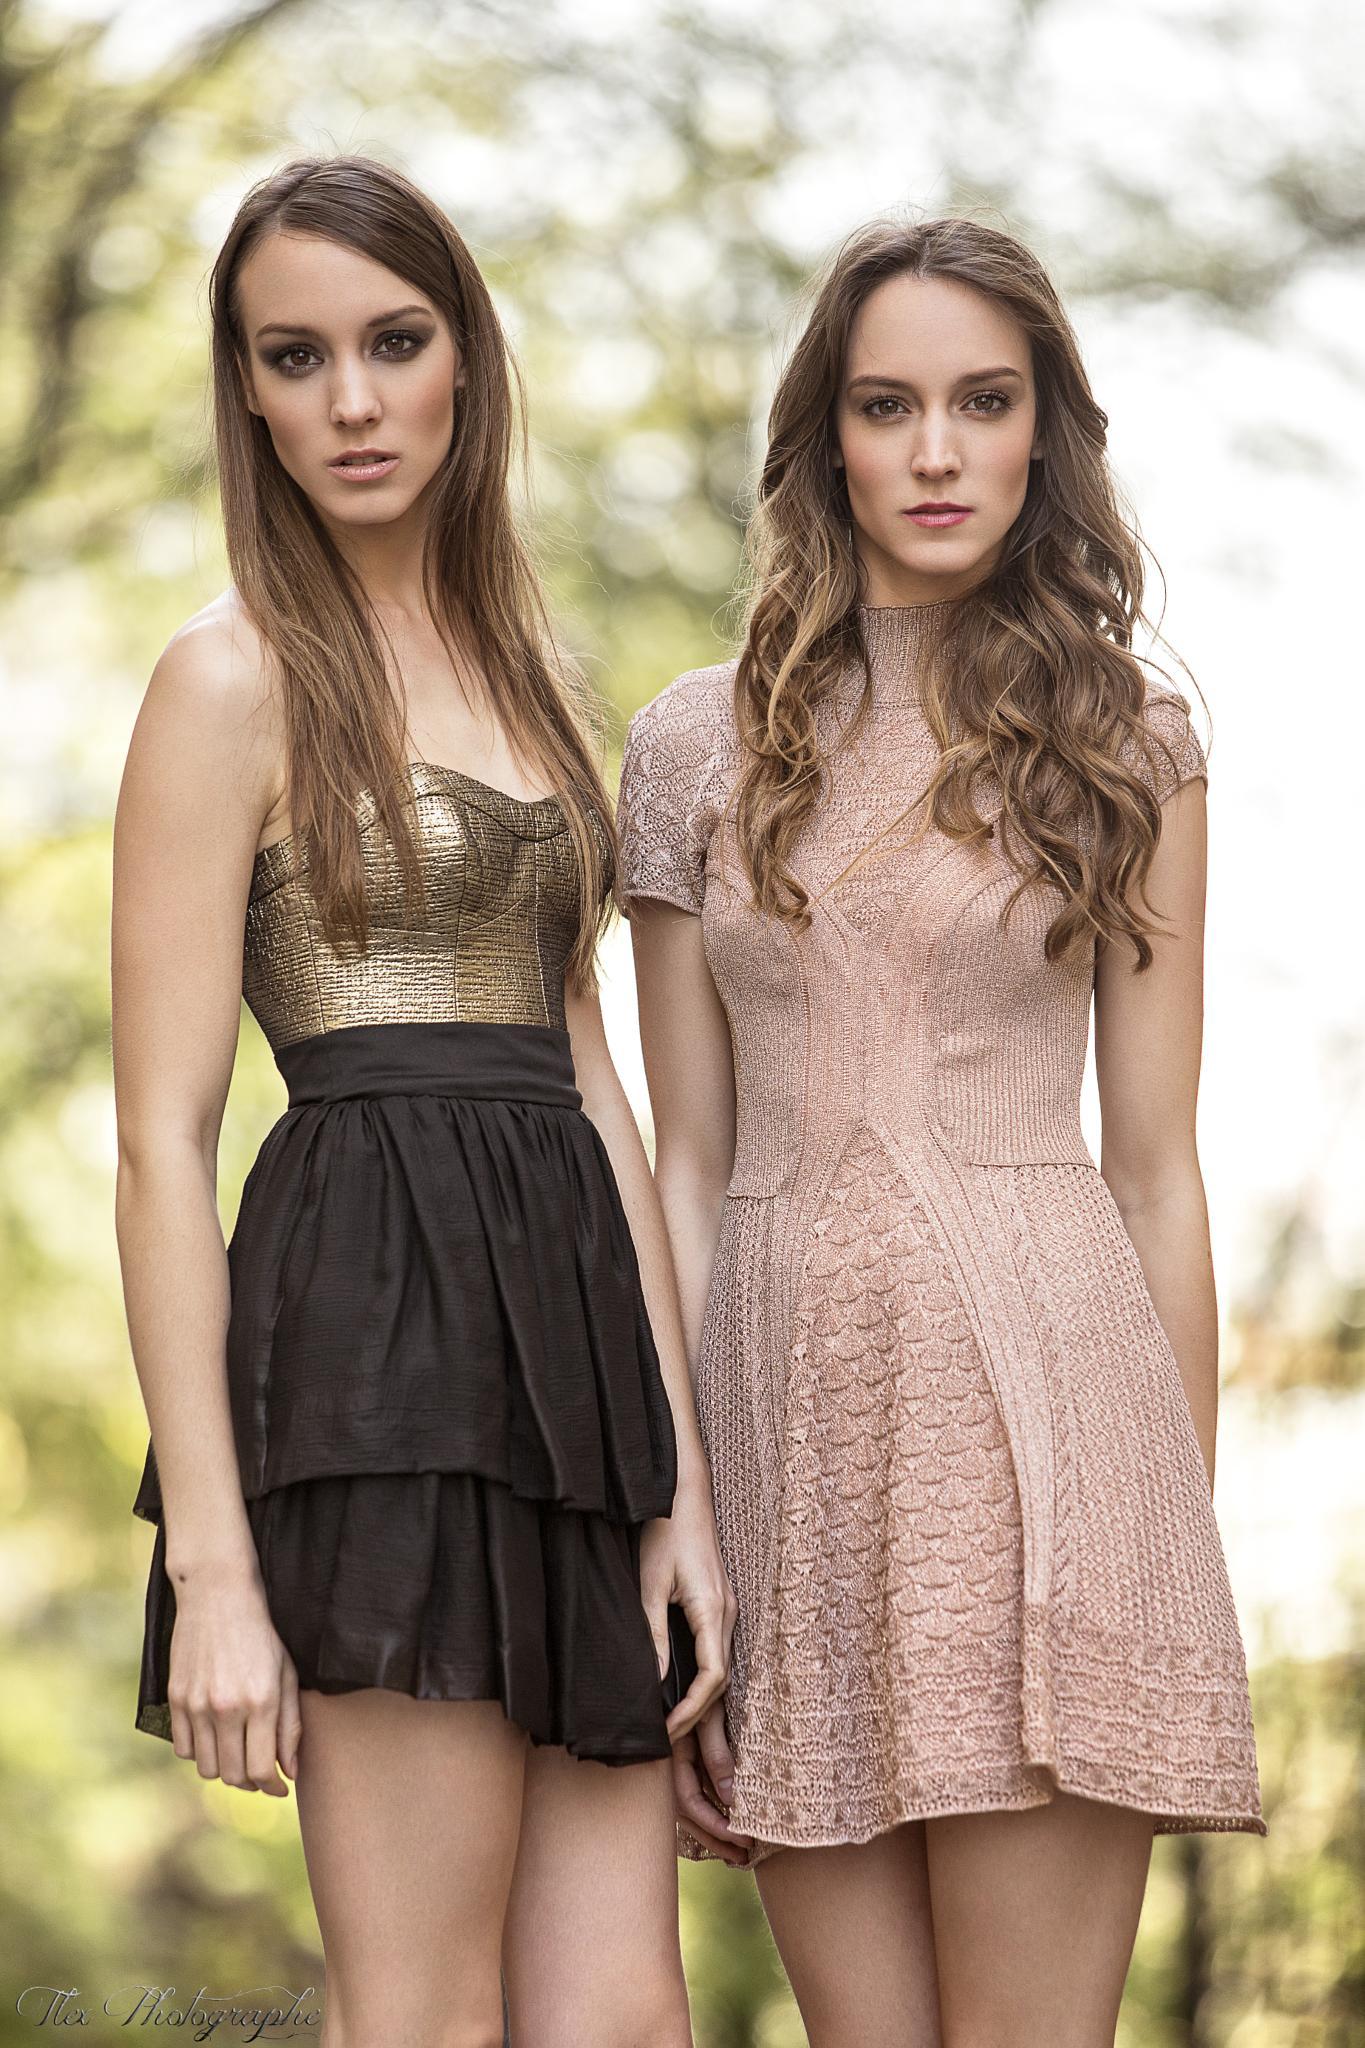 Twins by Tlex